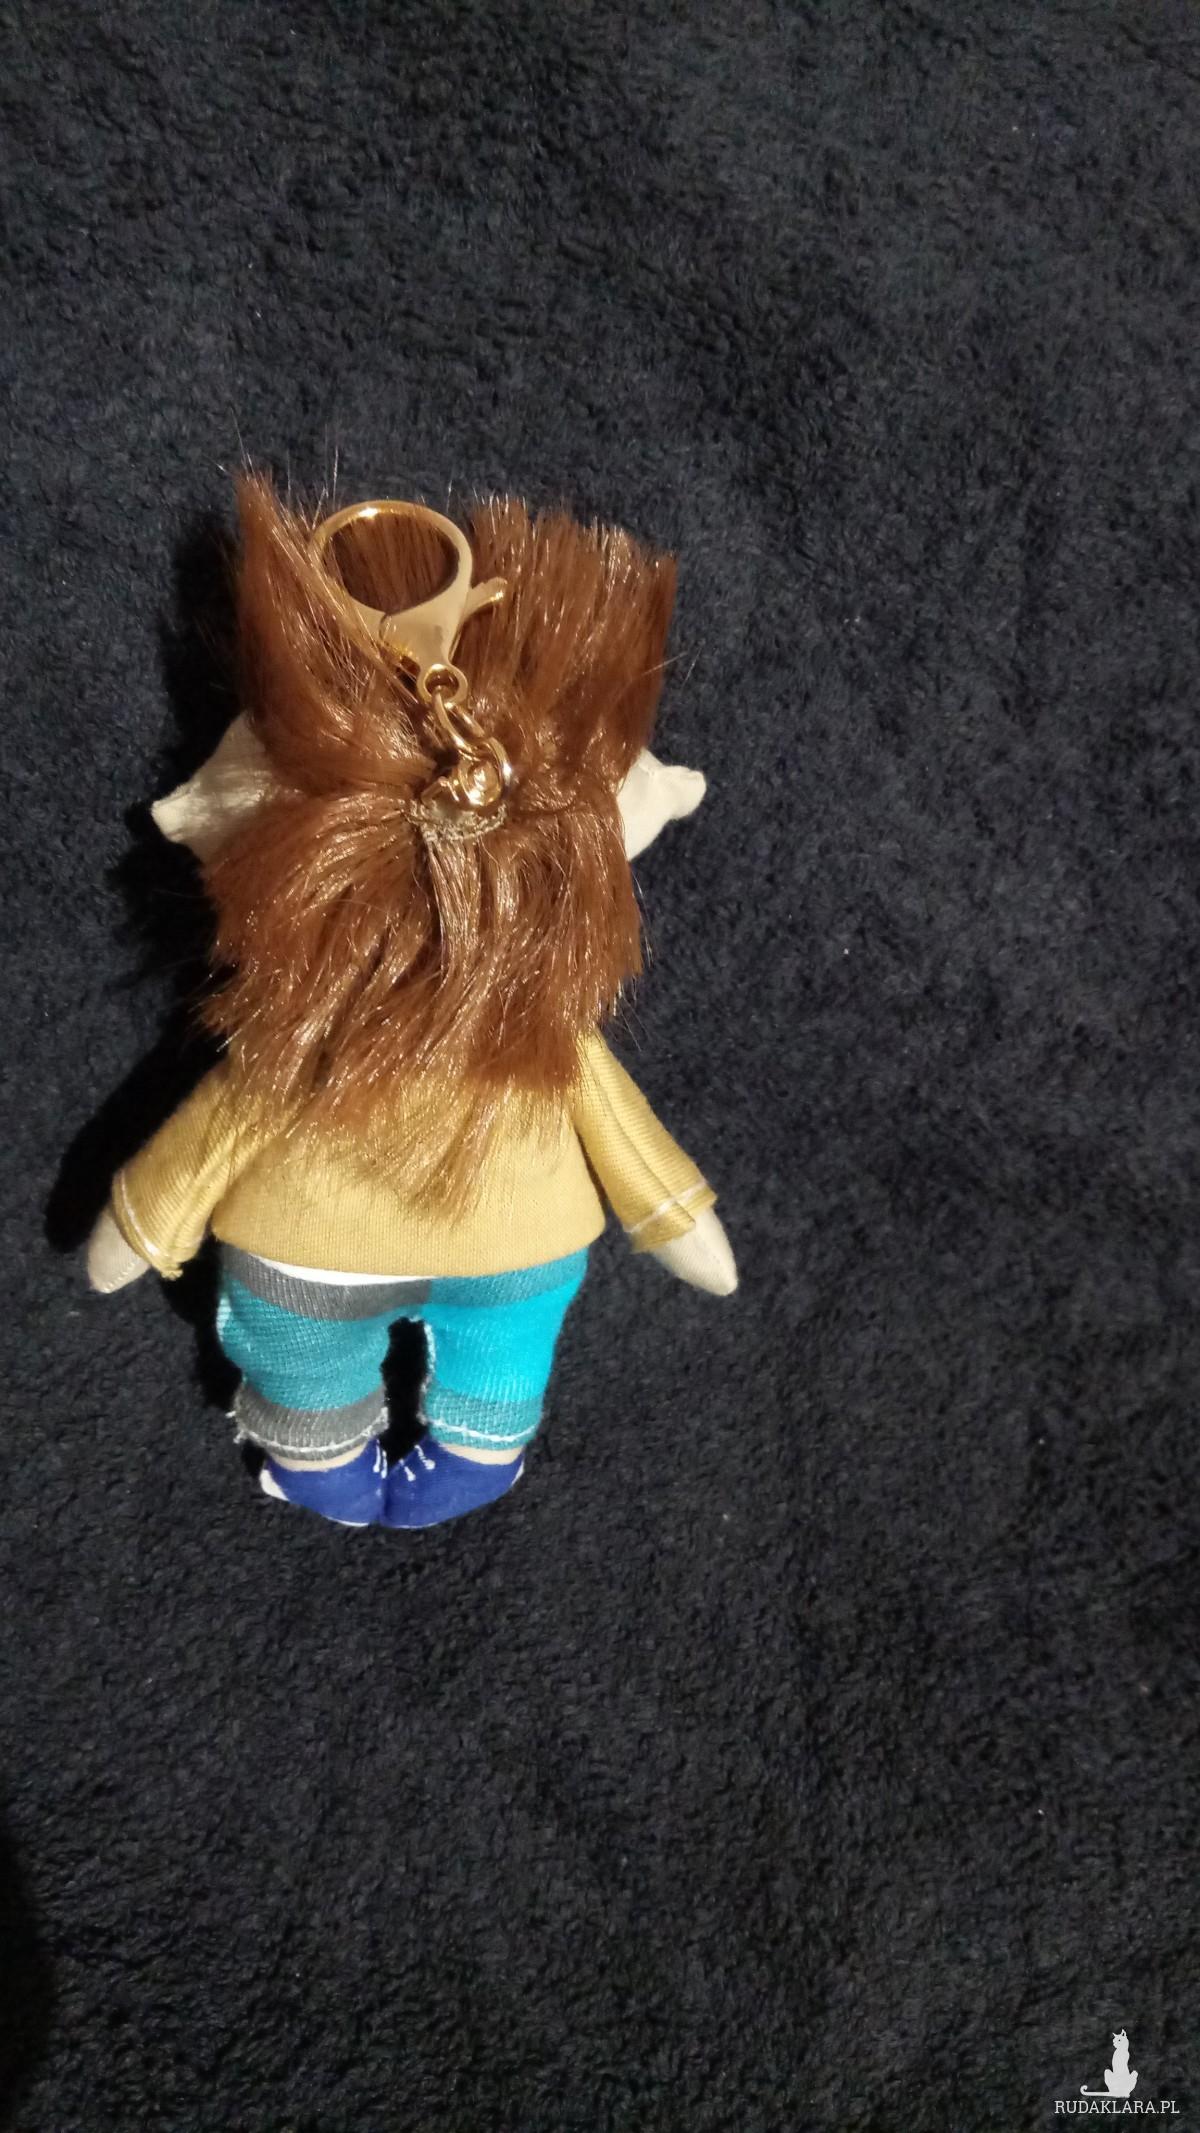 brelok lalka z irokezem